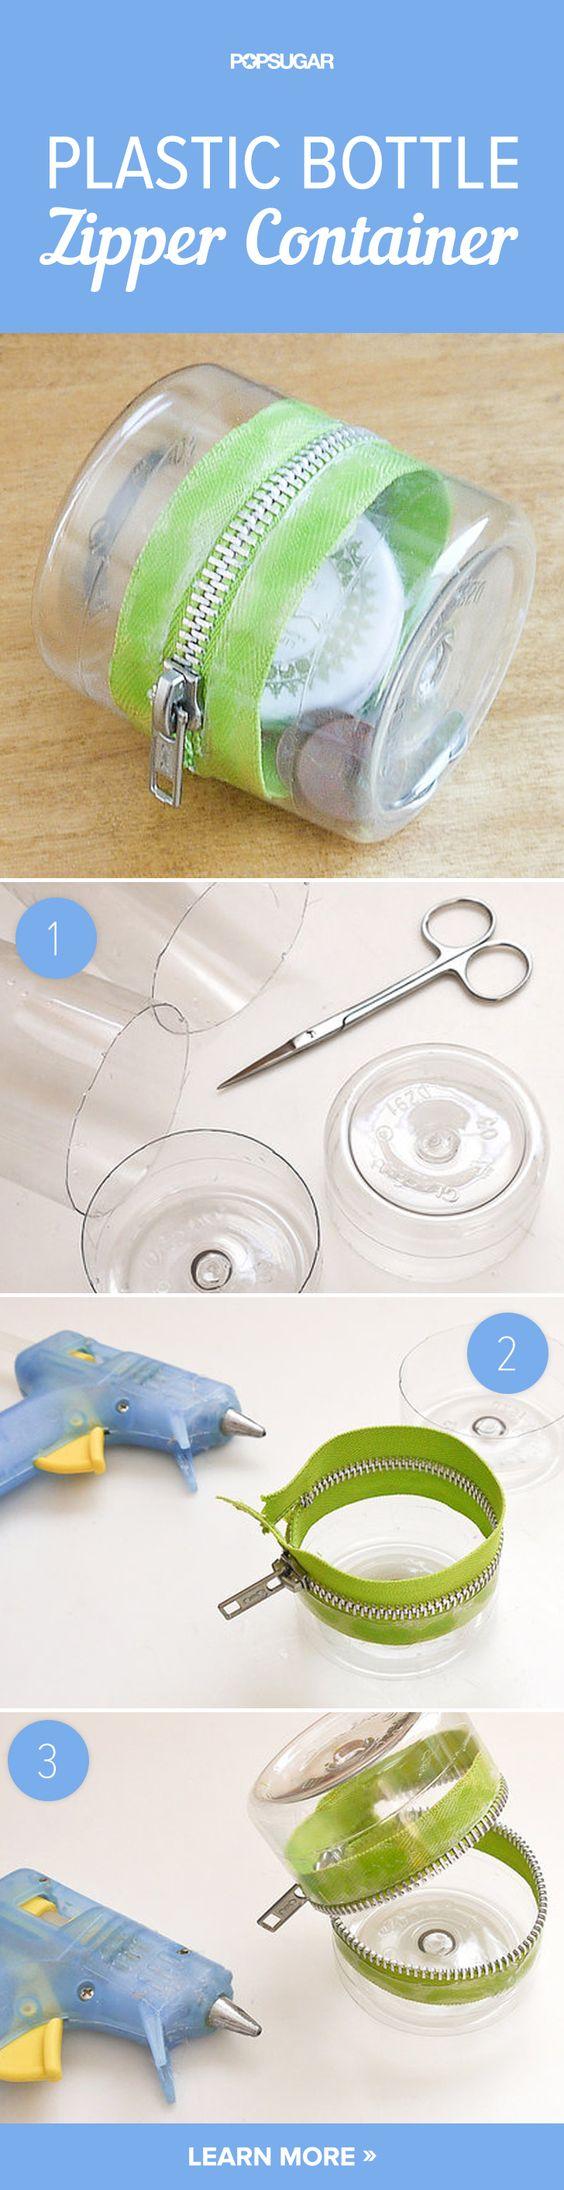 Plastic Bottle Zipper Container.